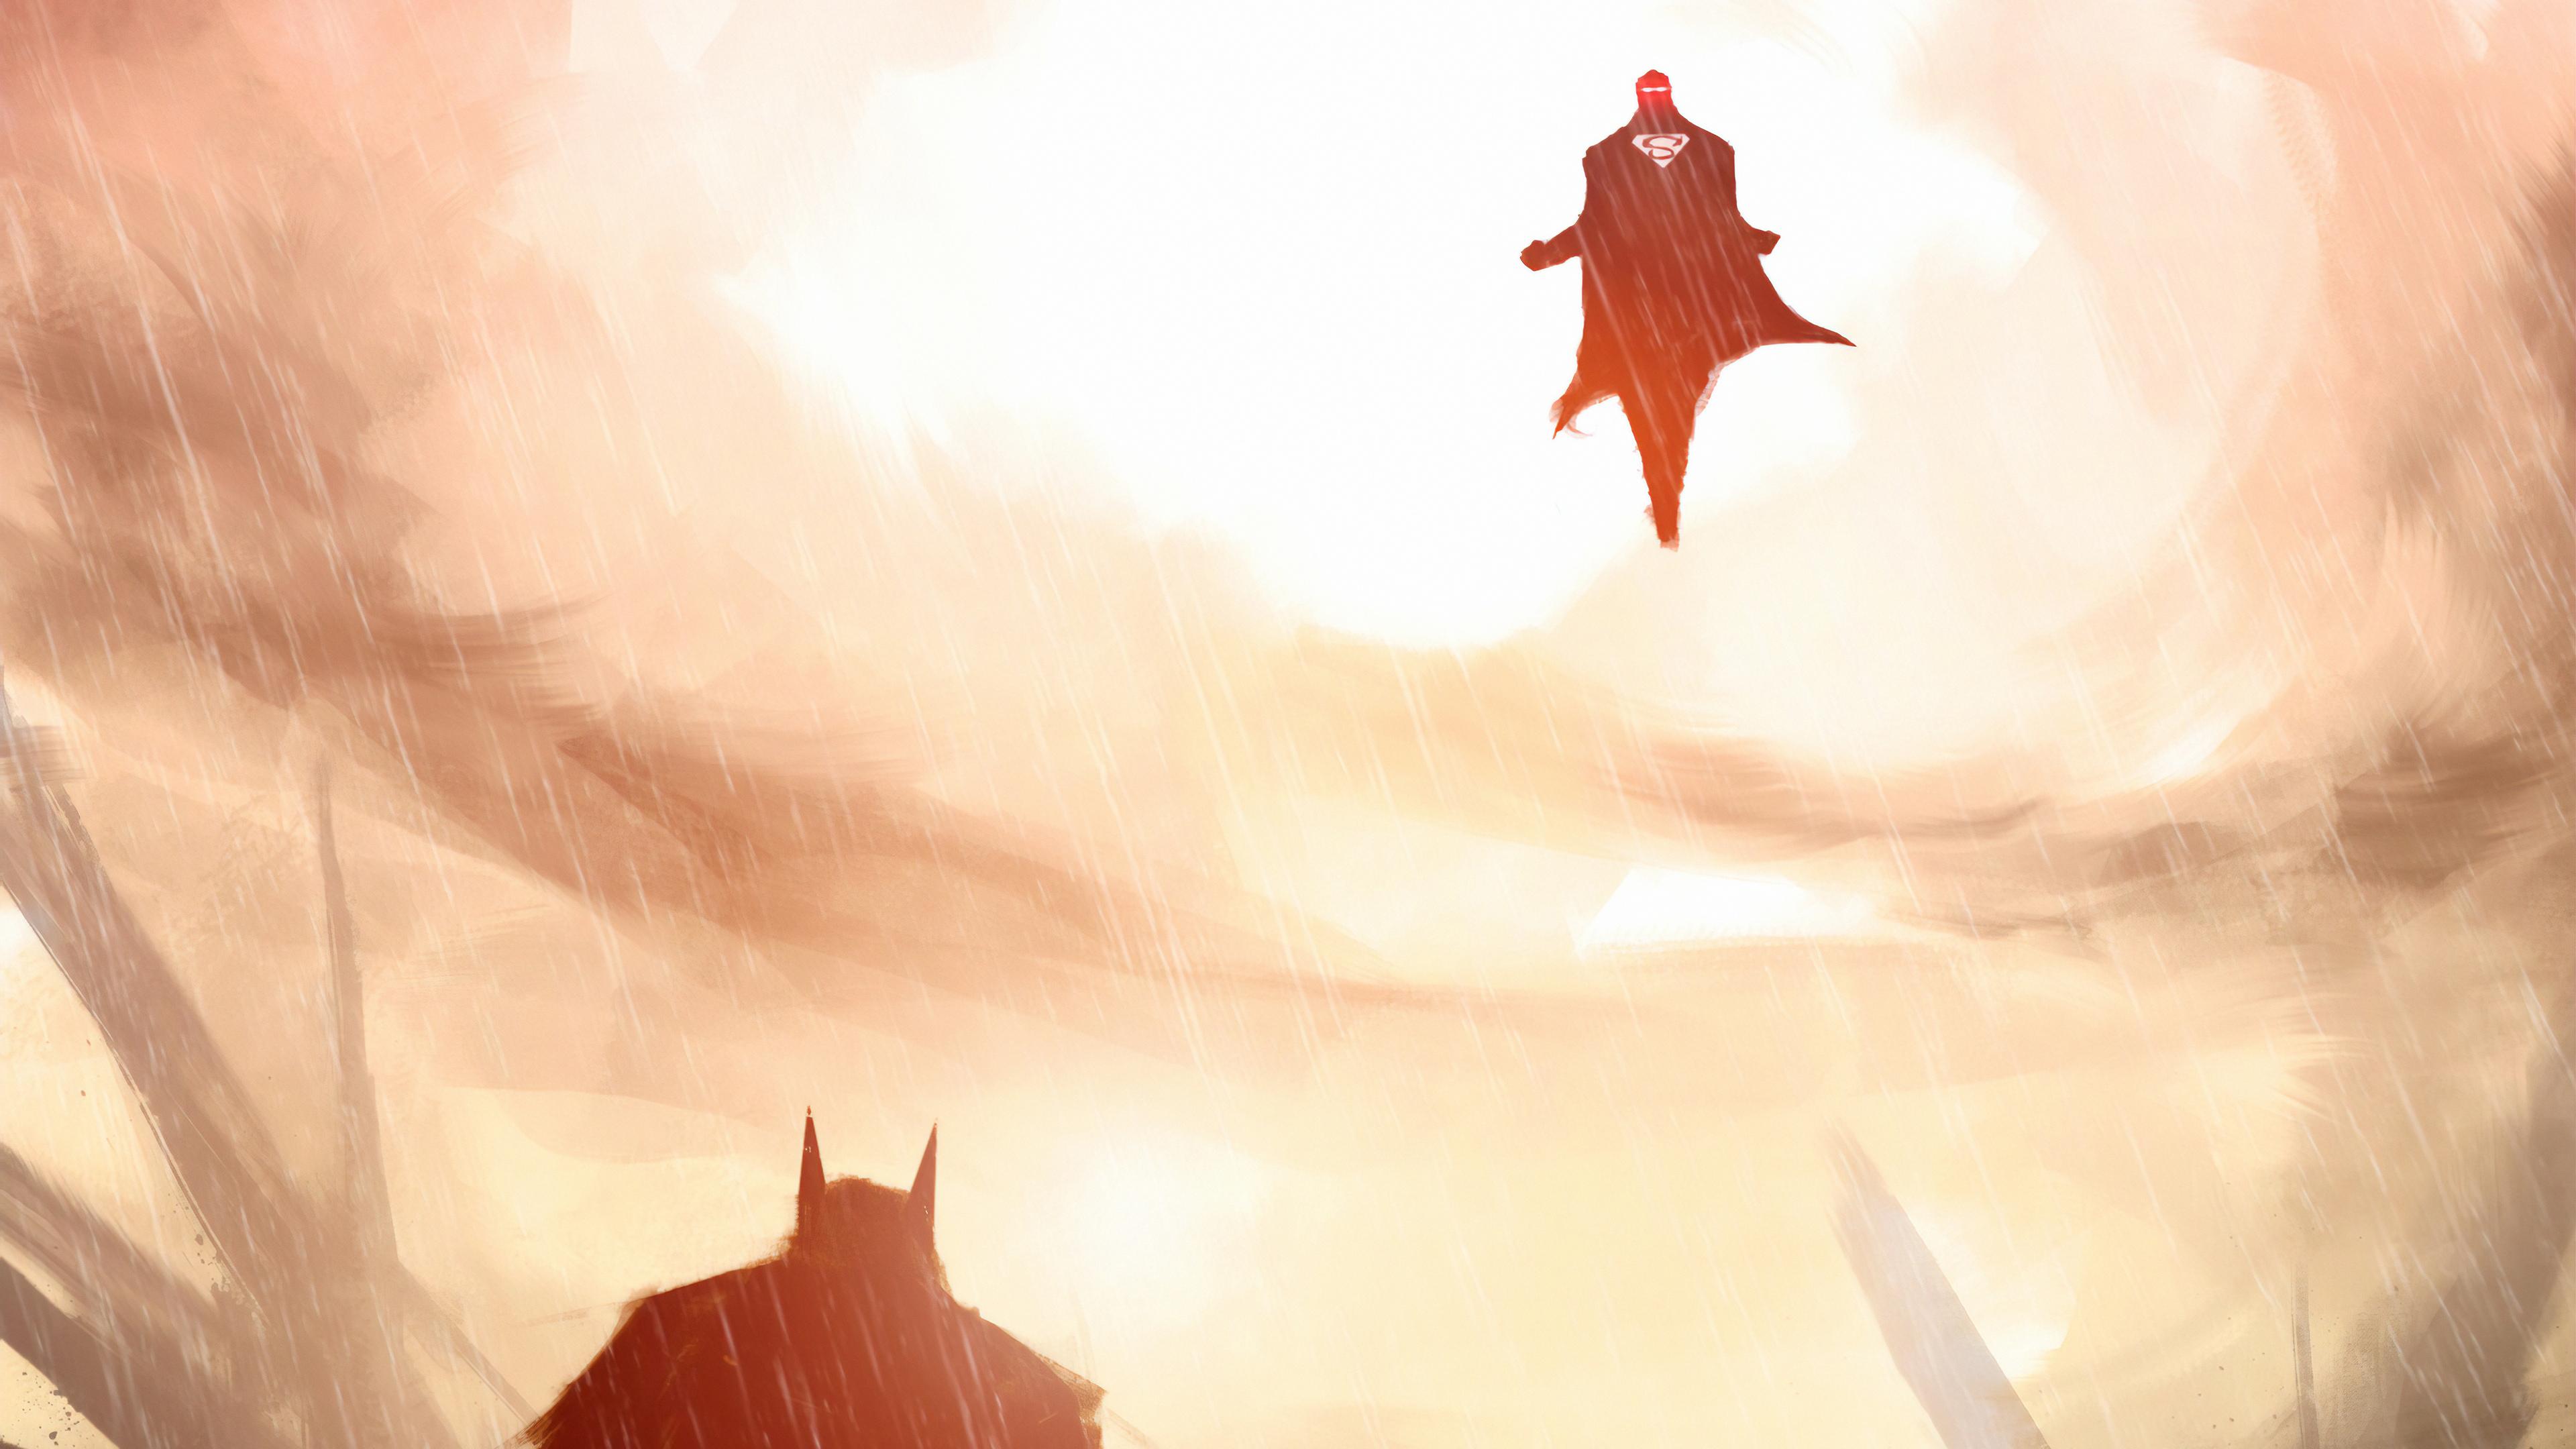 batman and superman art 1570394505 - Batman And Superman art - superman wallpapers, superheroes wallpapers, hd-wallpapers, digital art wallpapers, batman wallpapers, artwork wallpapers, artstation wallpapers, 4k-wallpapers